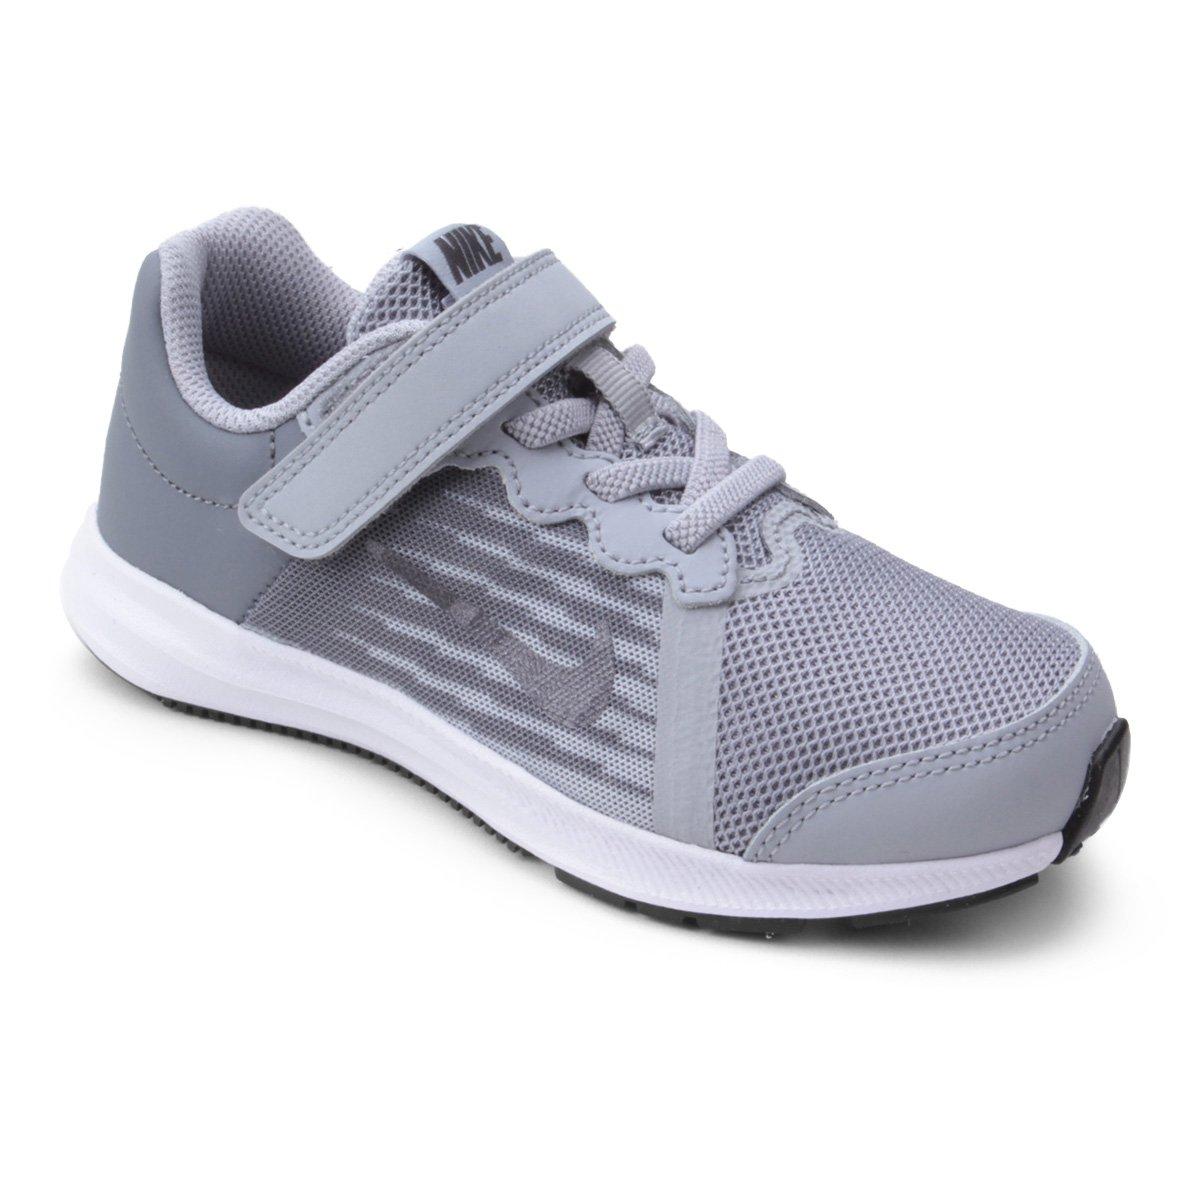 21eea02b43 Tênis Infantil Nike Downshifter 8 Bpv Masculino